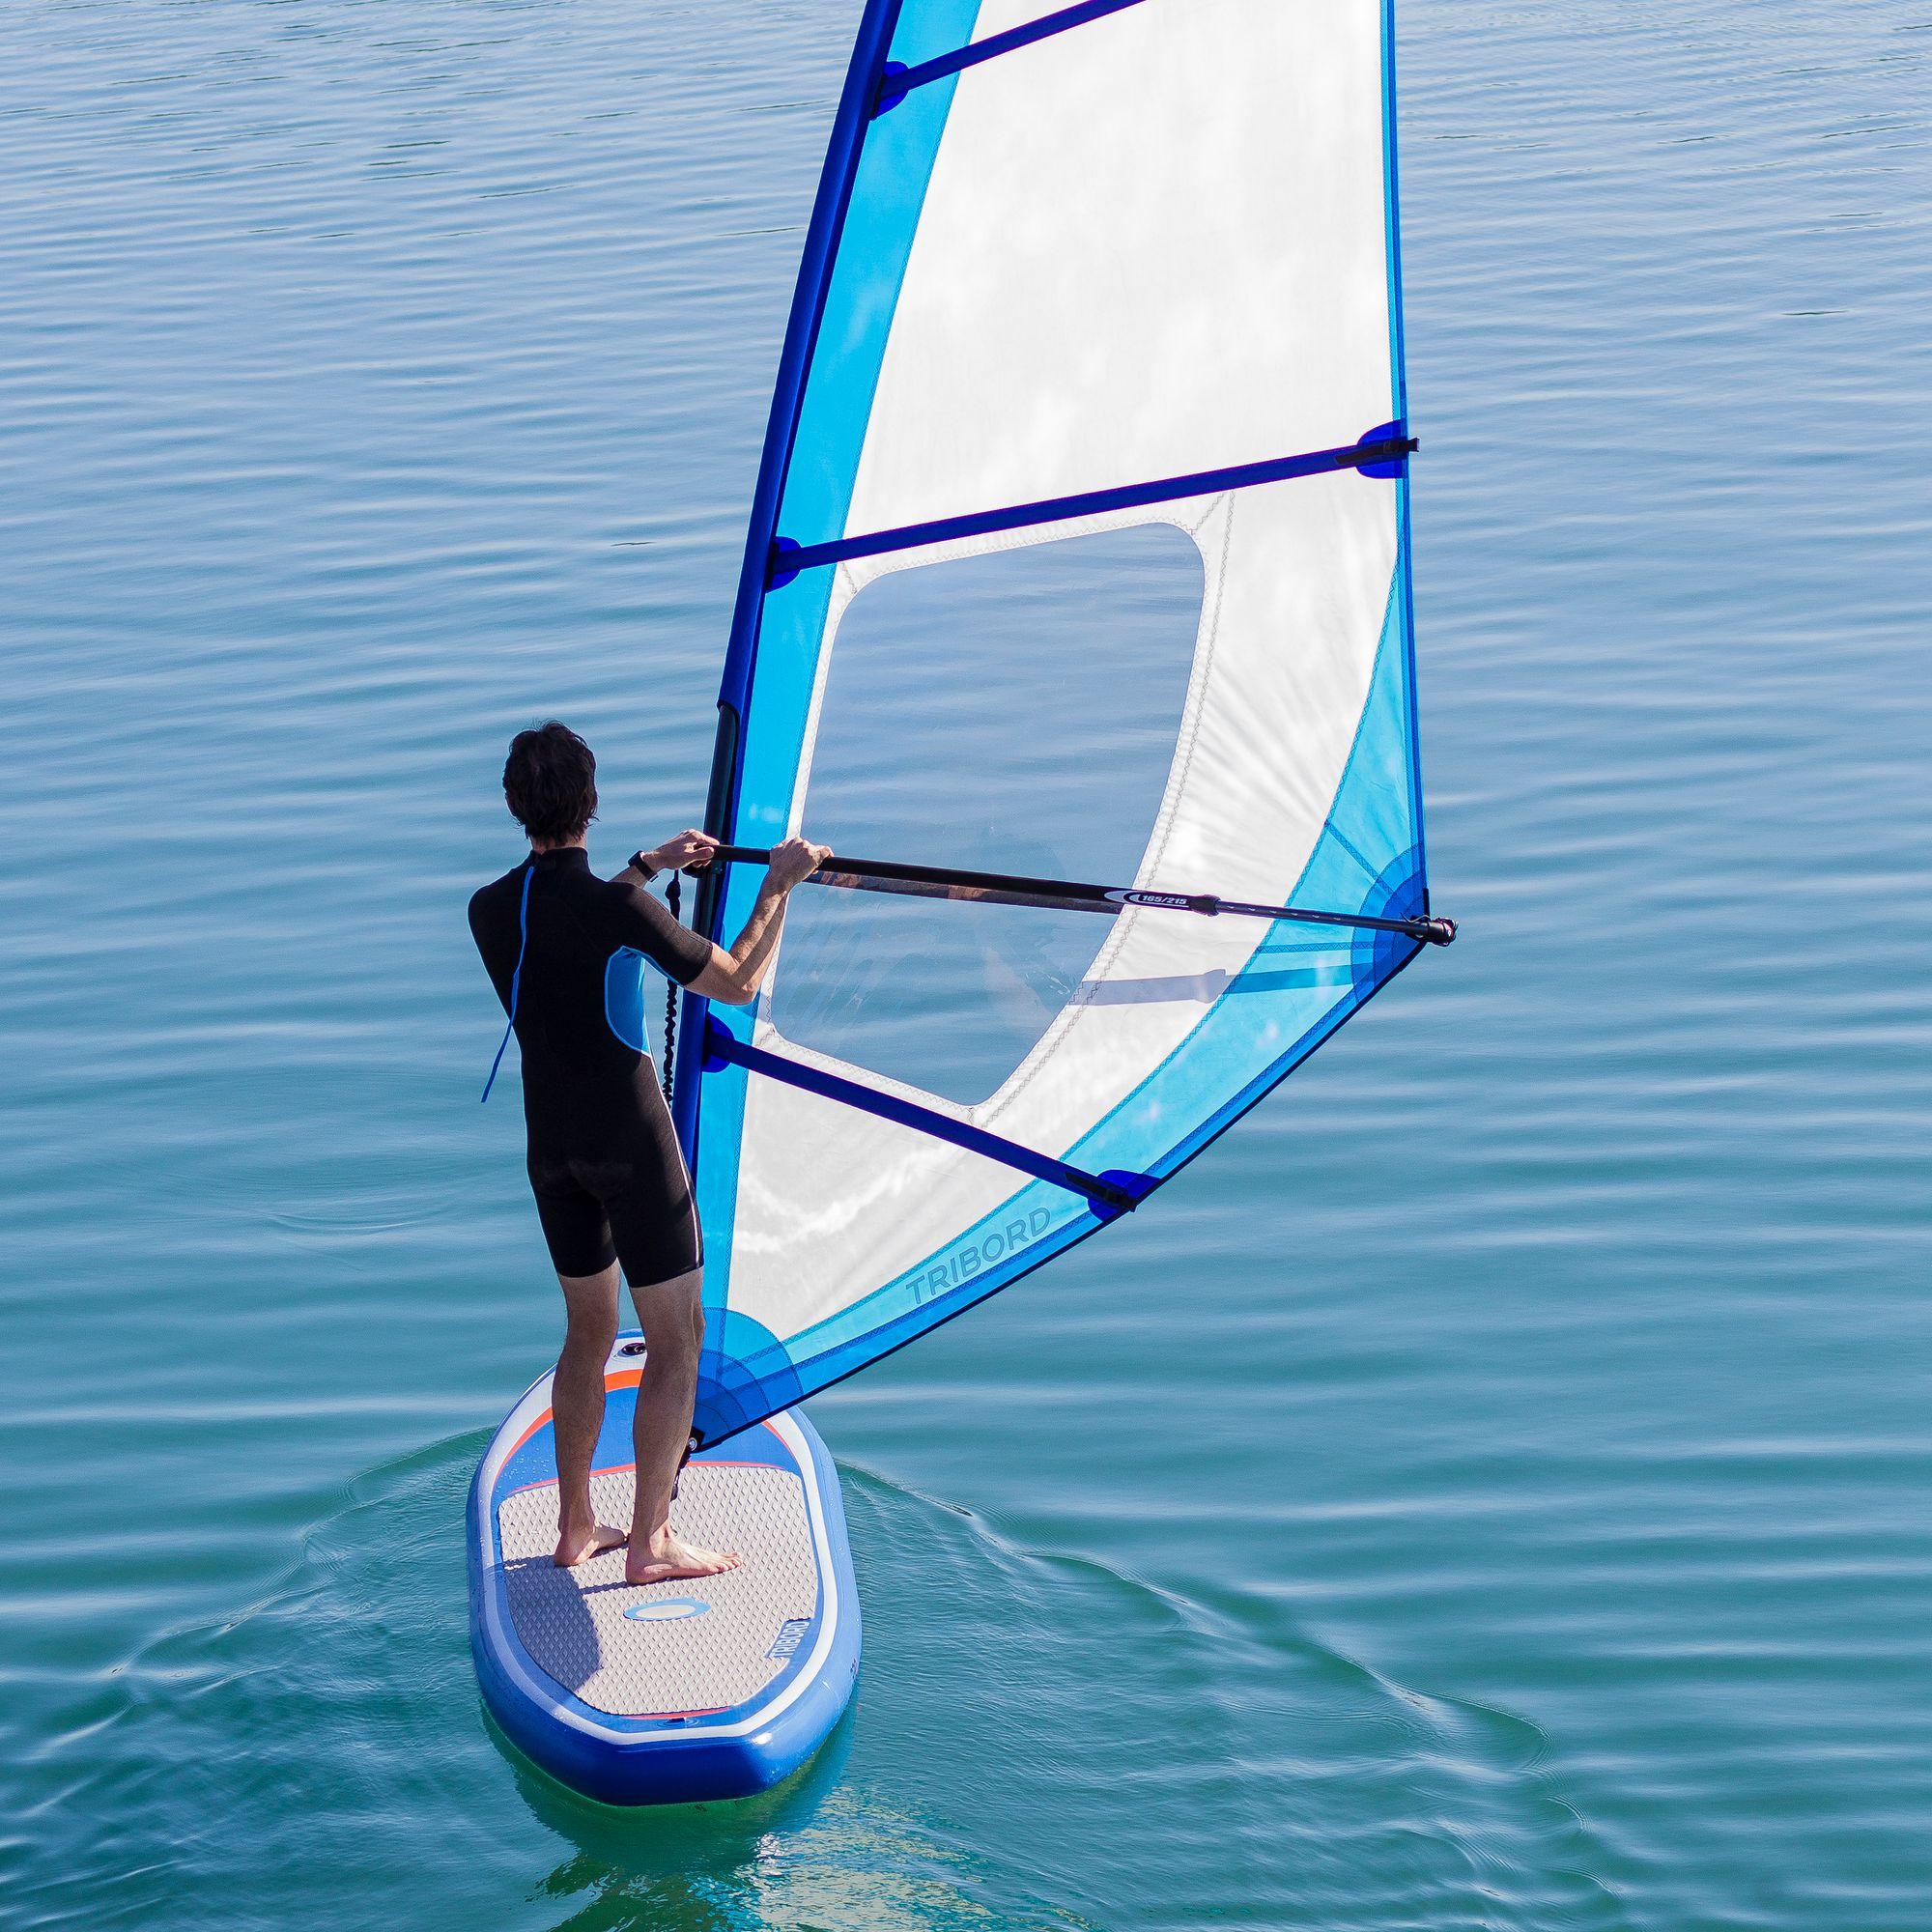 planche voile gonflable 320l adapt e l 39 apprentissage du windsurf clubs collectivit s. Black Bedroom Furniture Sets. Home Design Ideas